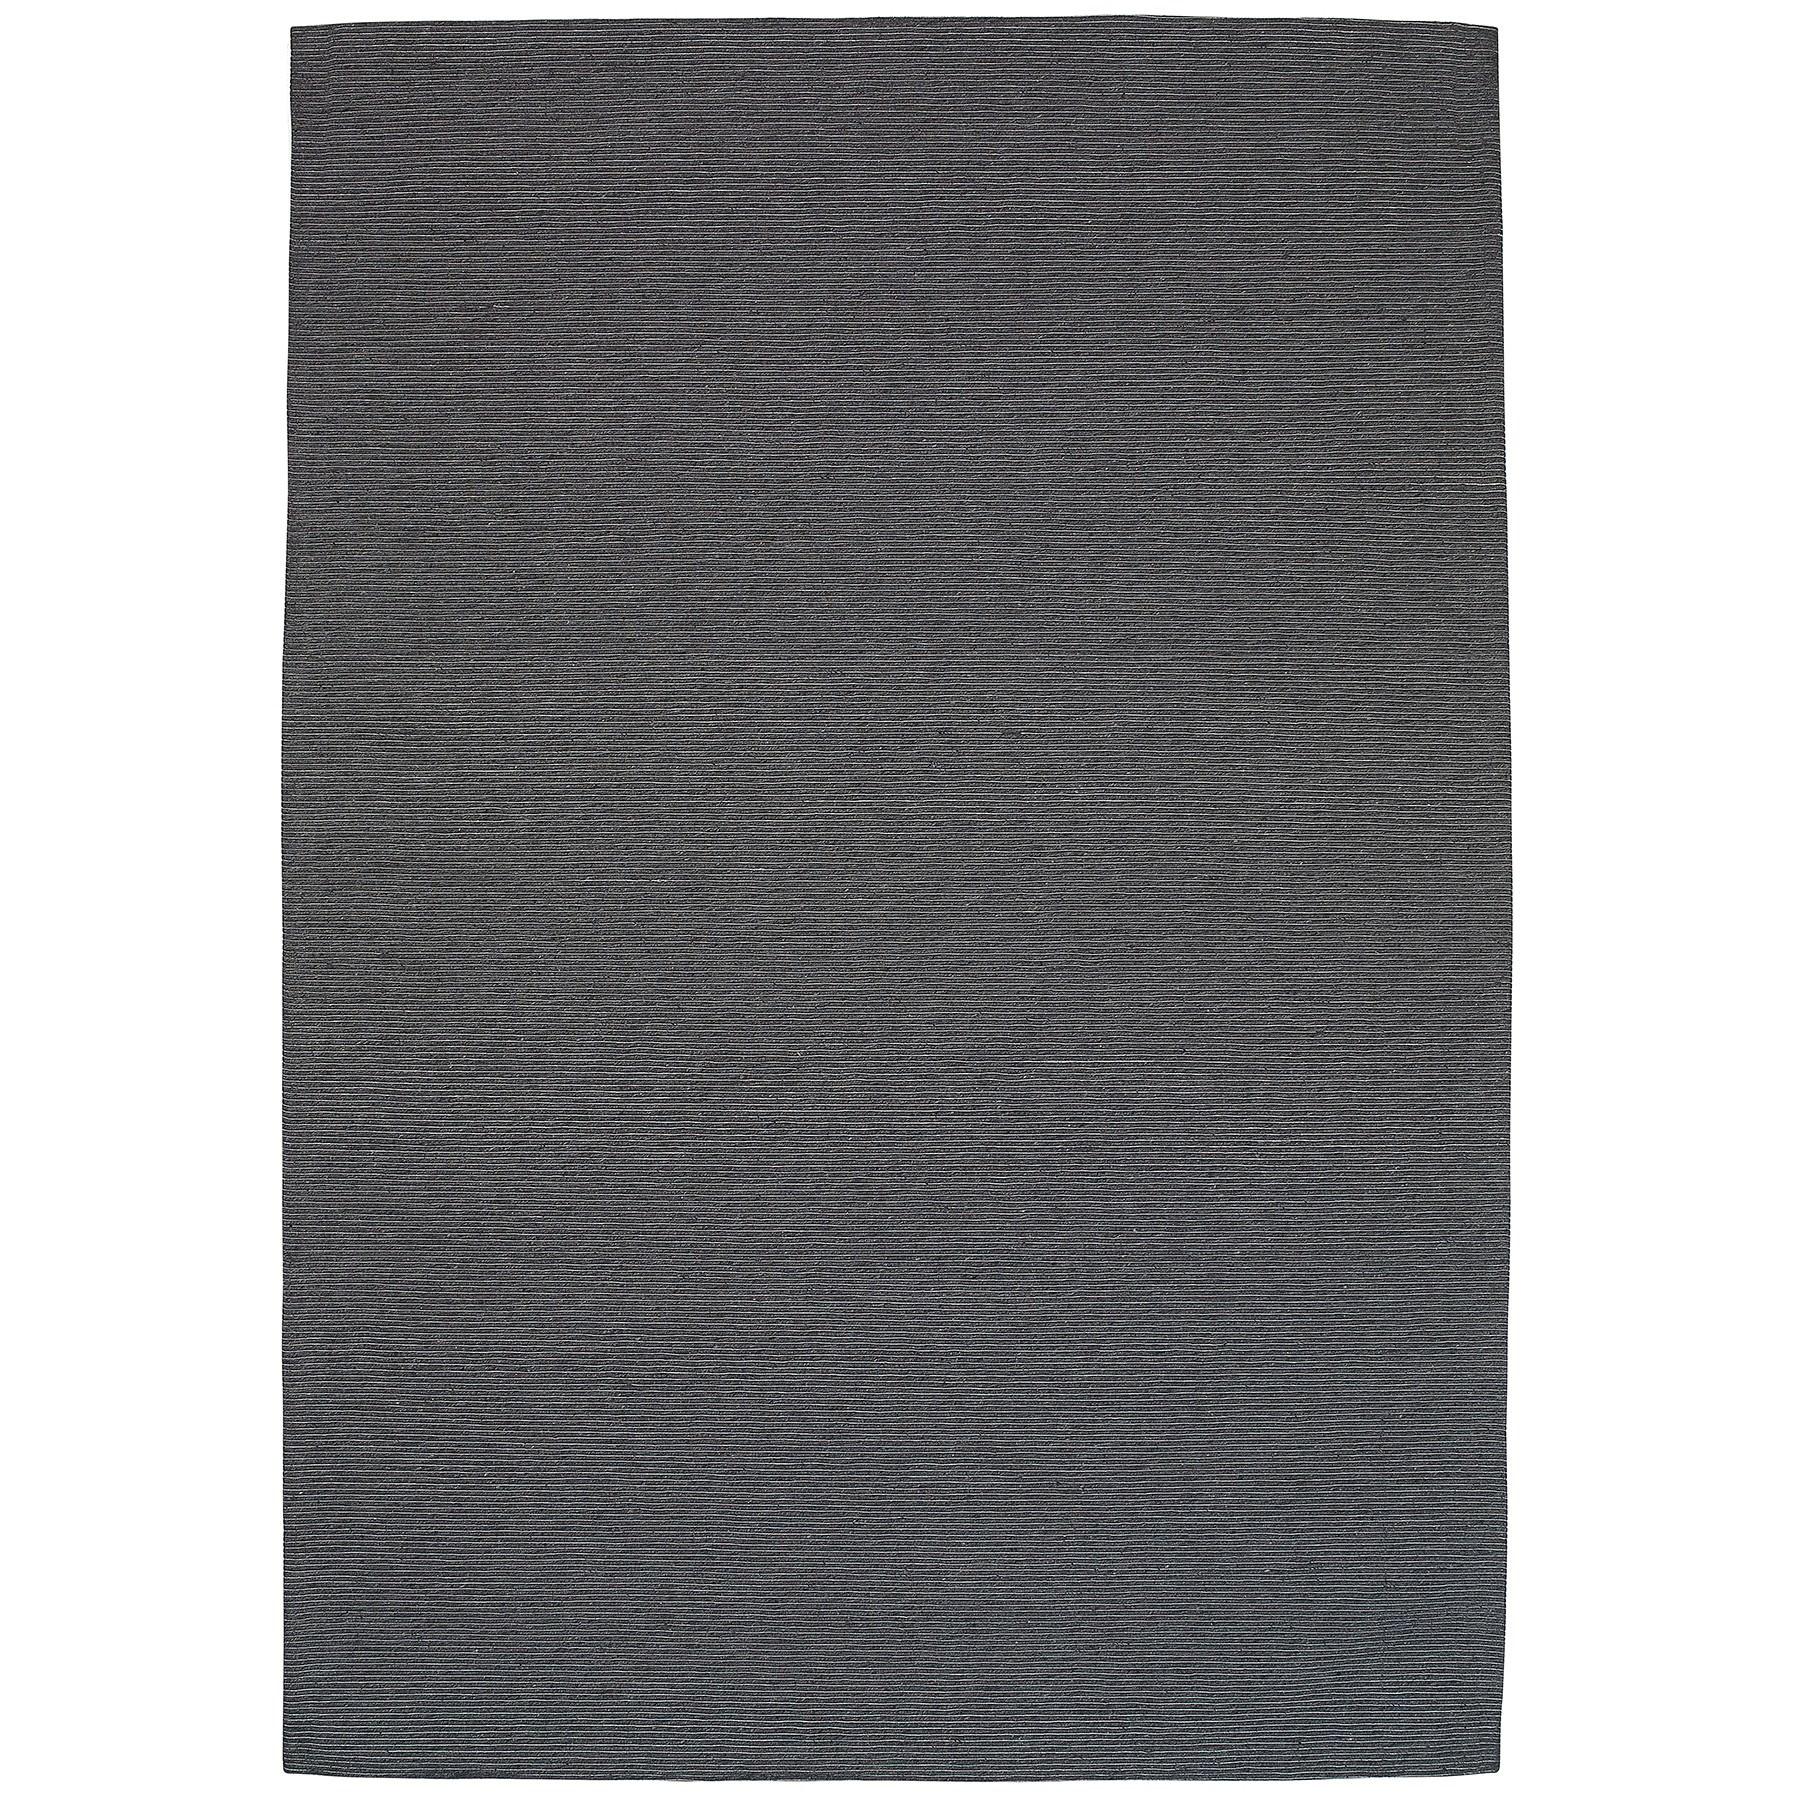 Shire Modern Wool Rug, 290x200cm, Charcoal